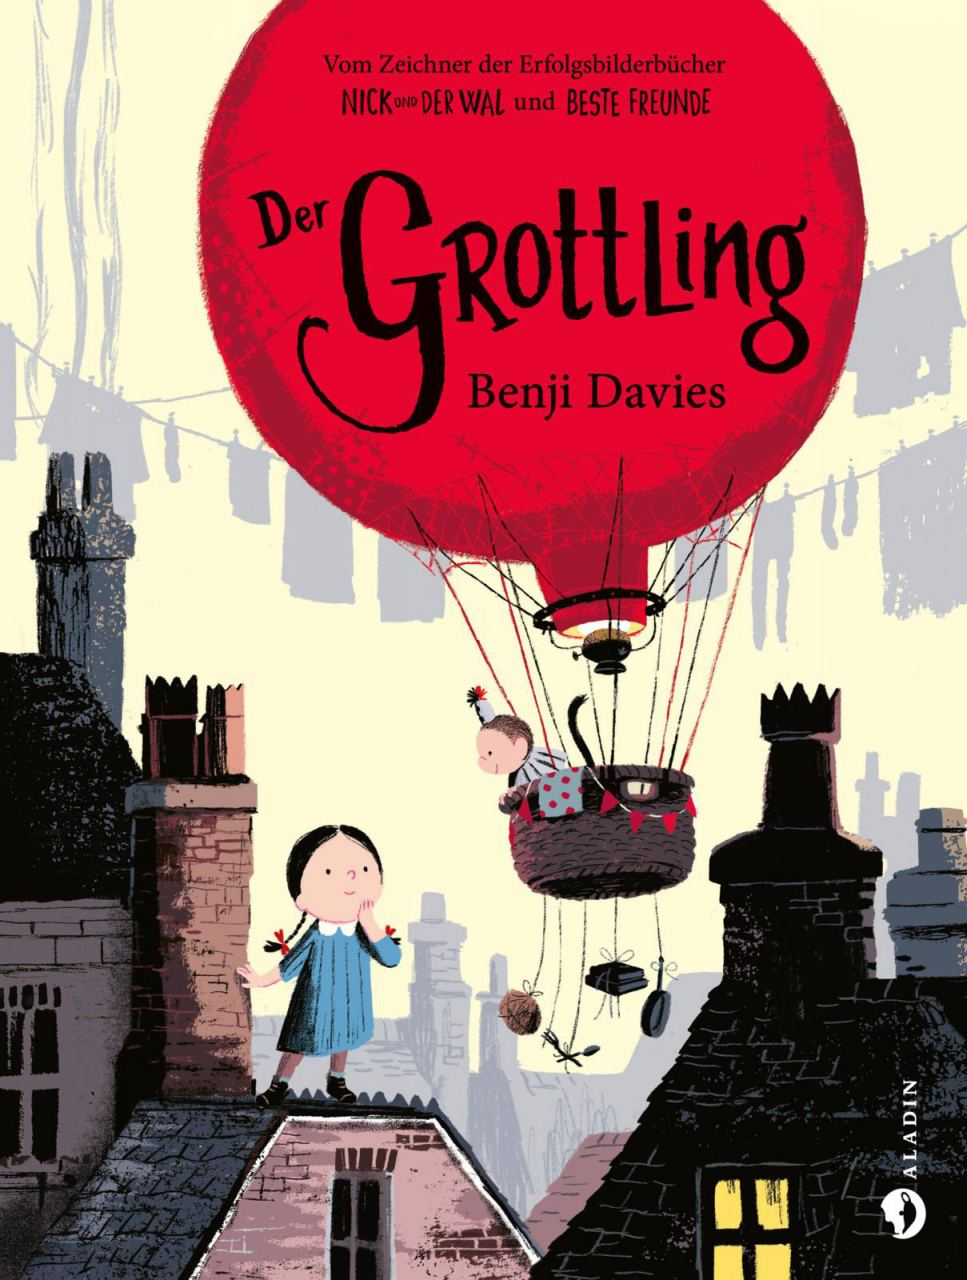 Benji Davies: Der Grottling